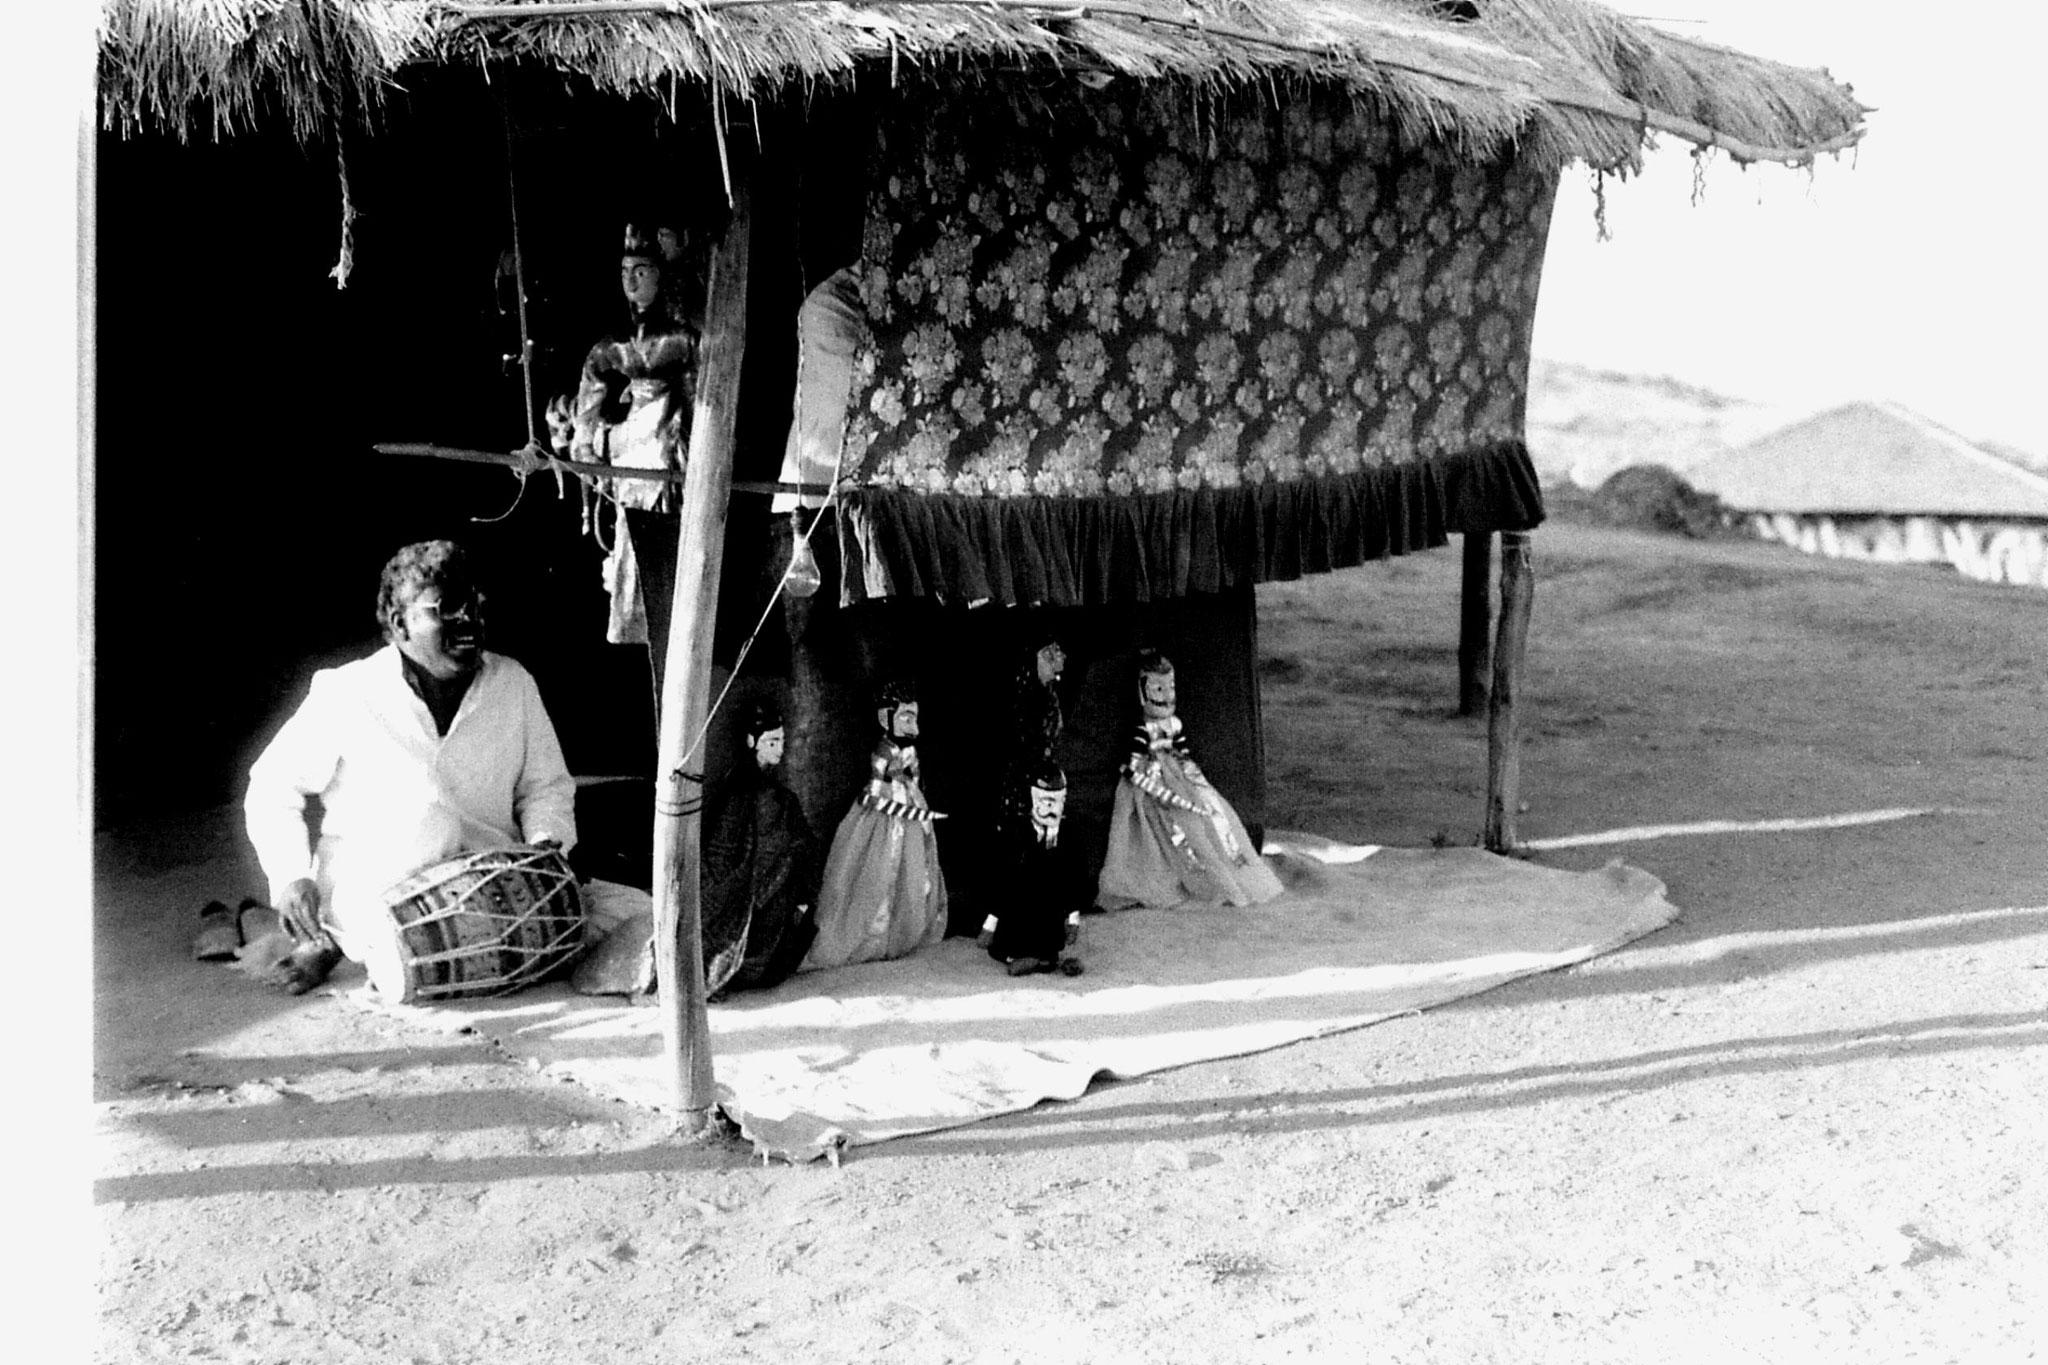 8/12/1989: 17: Udaipur, Shilp Gram Craft Centre puppet show